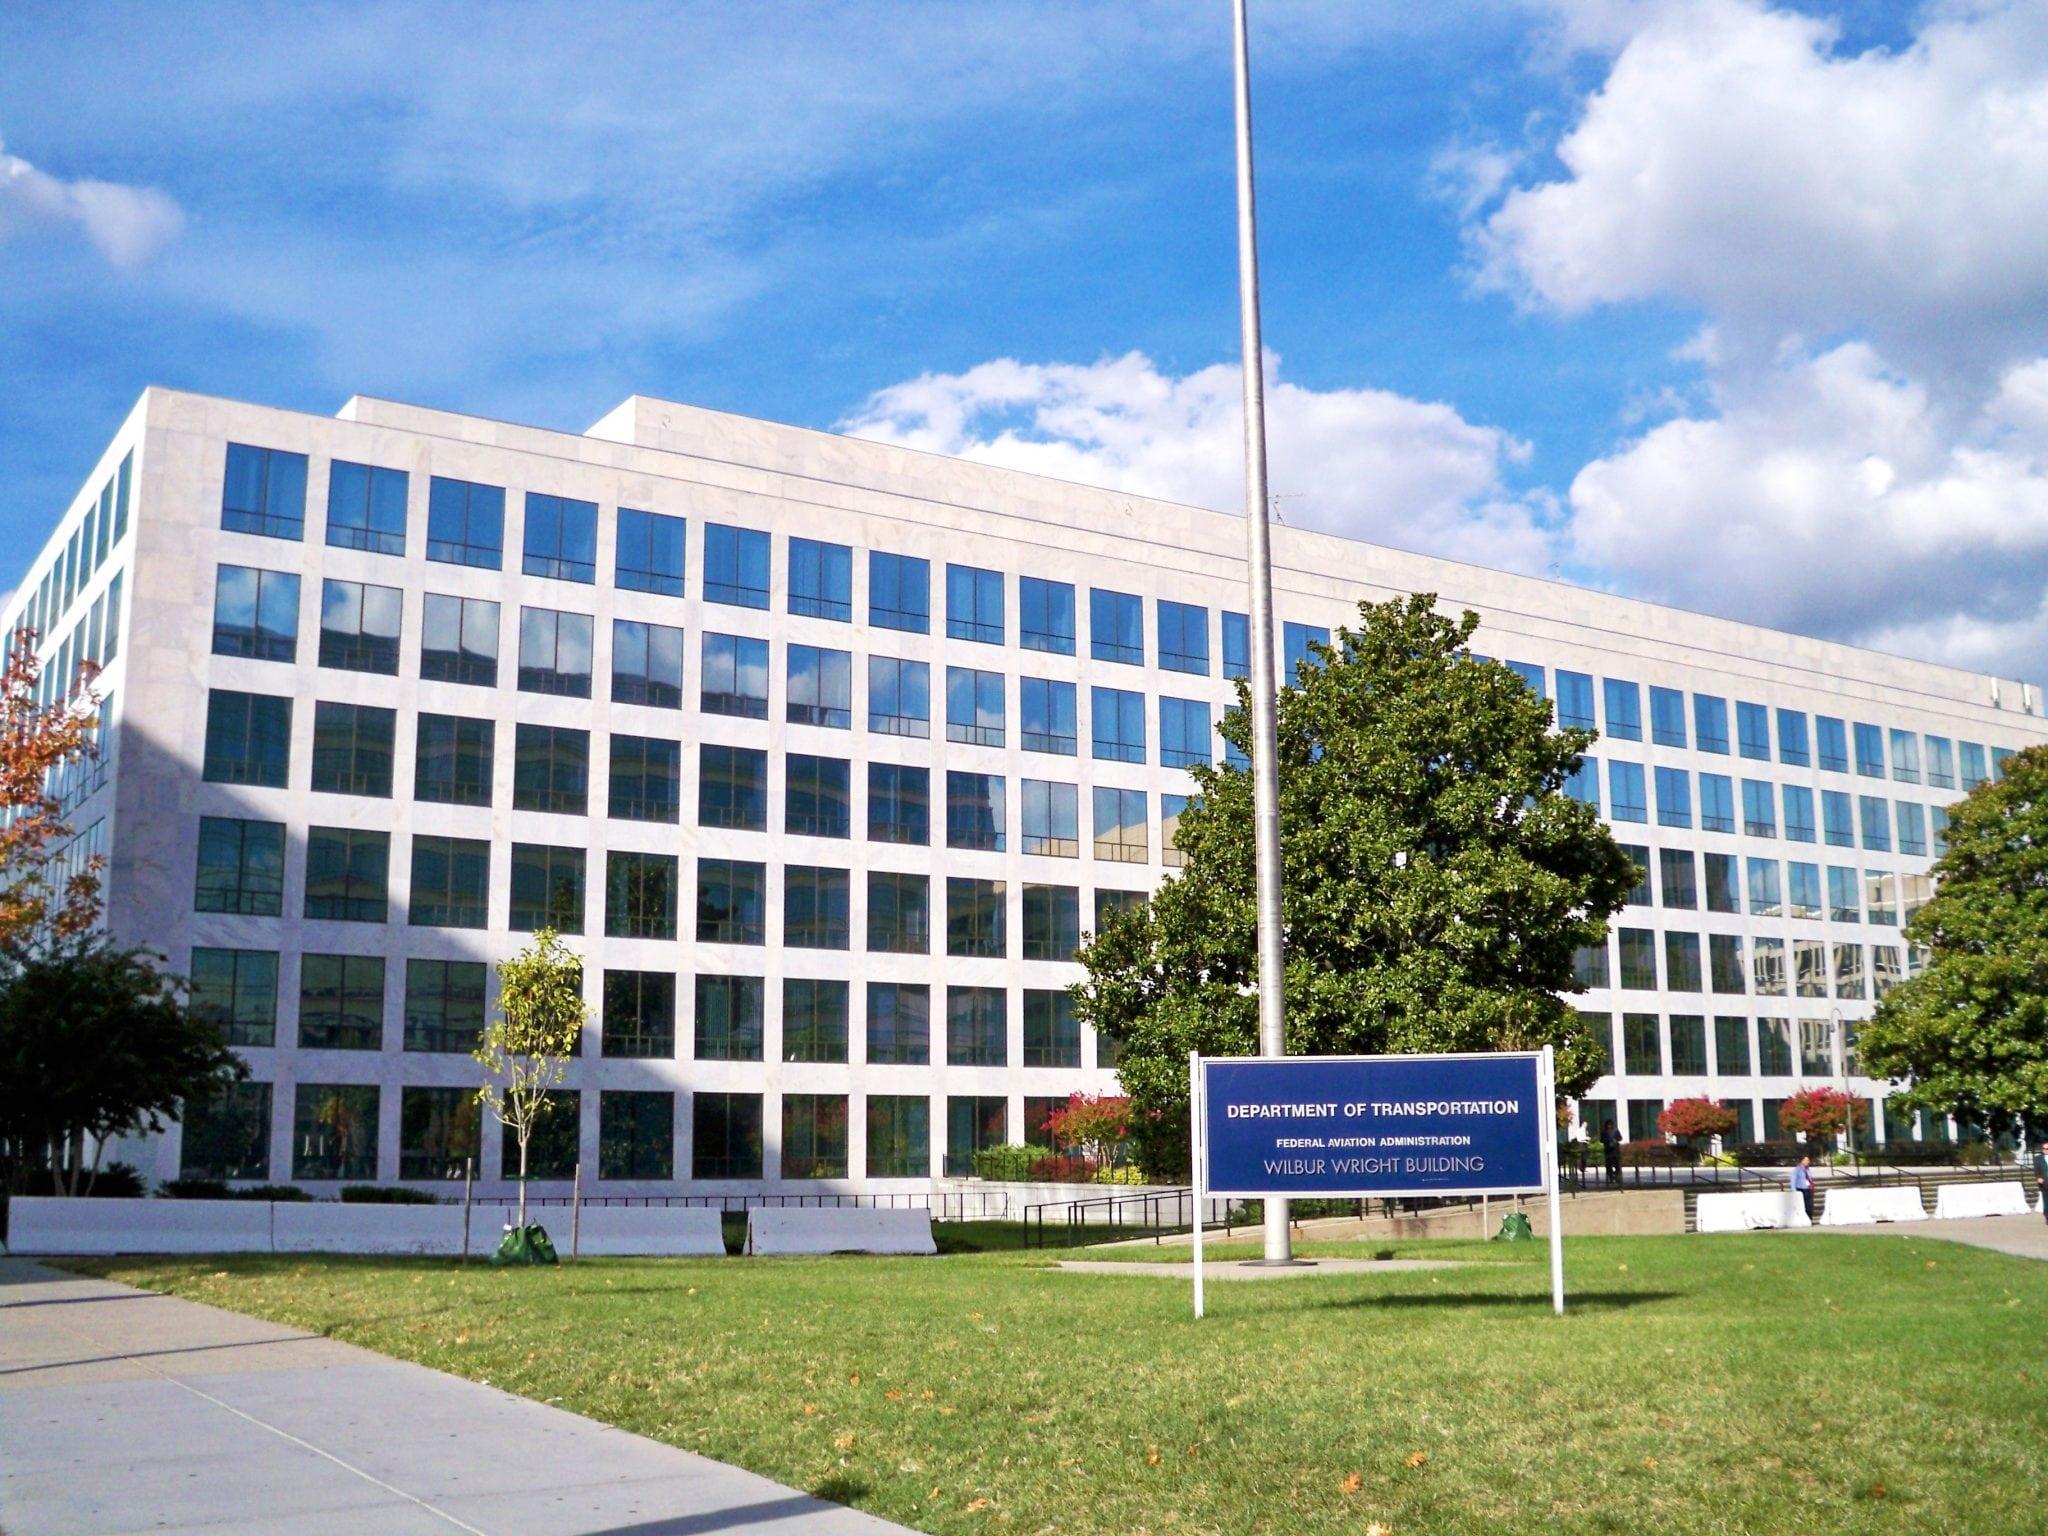 FAA Headquarters in Washington, D.C.